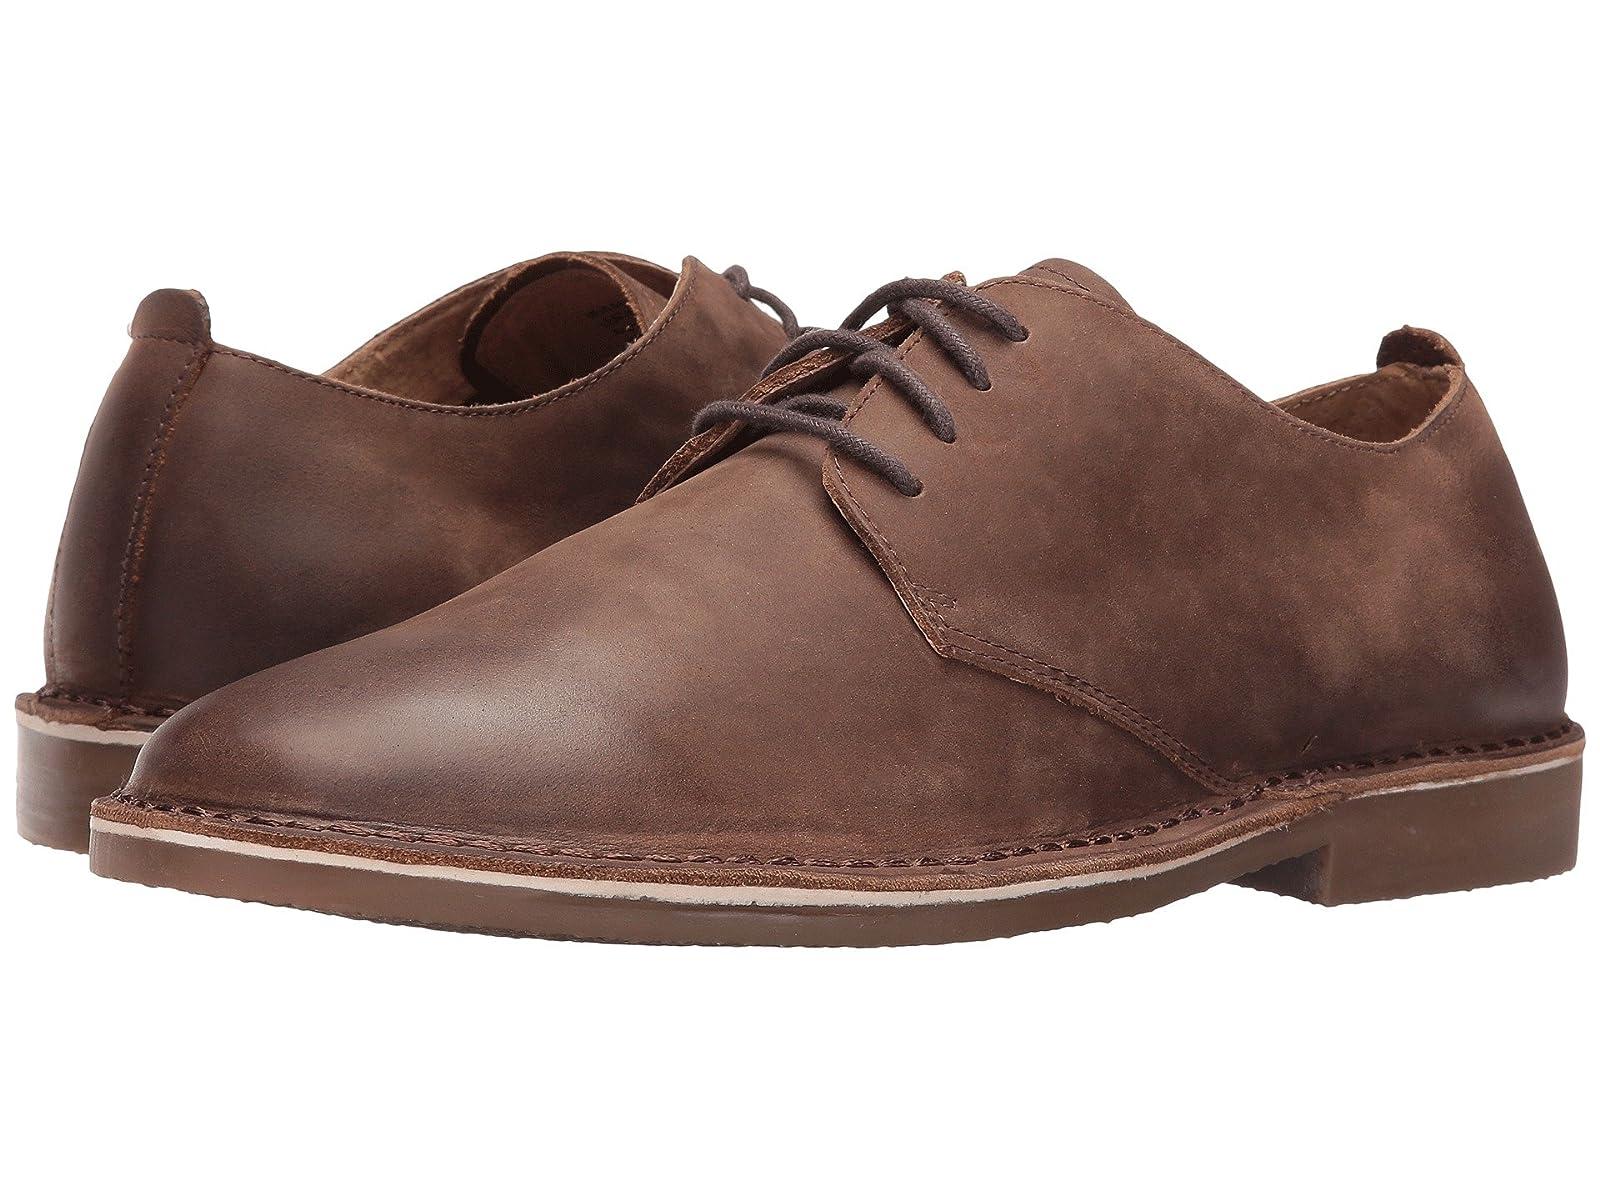 Nunn Bush Gordy Plain Toe OxfordAtmospheric grades have affordable shoes